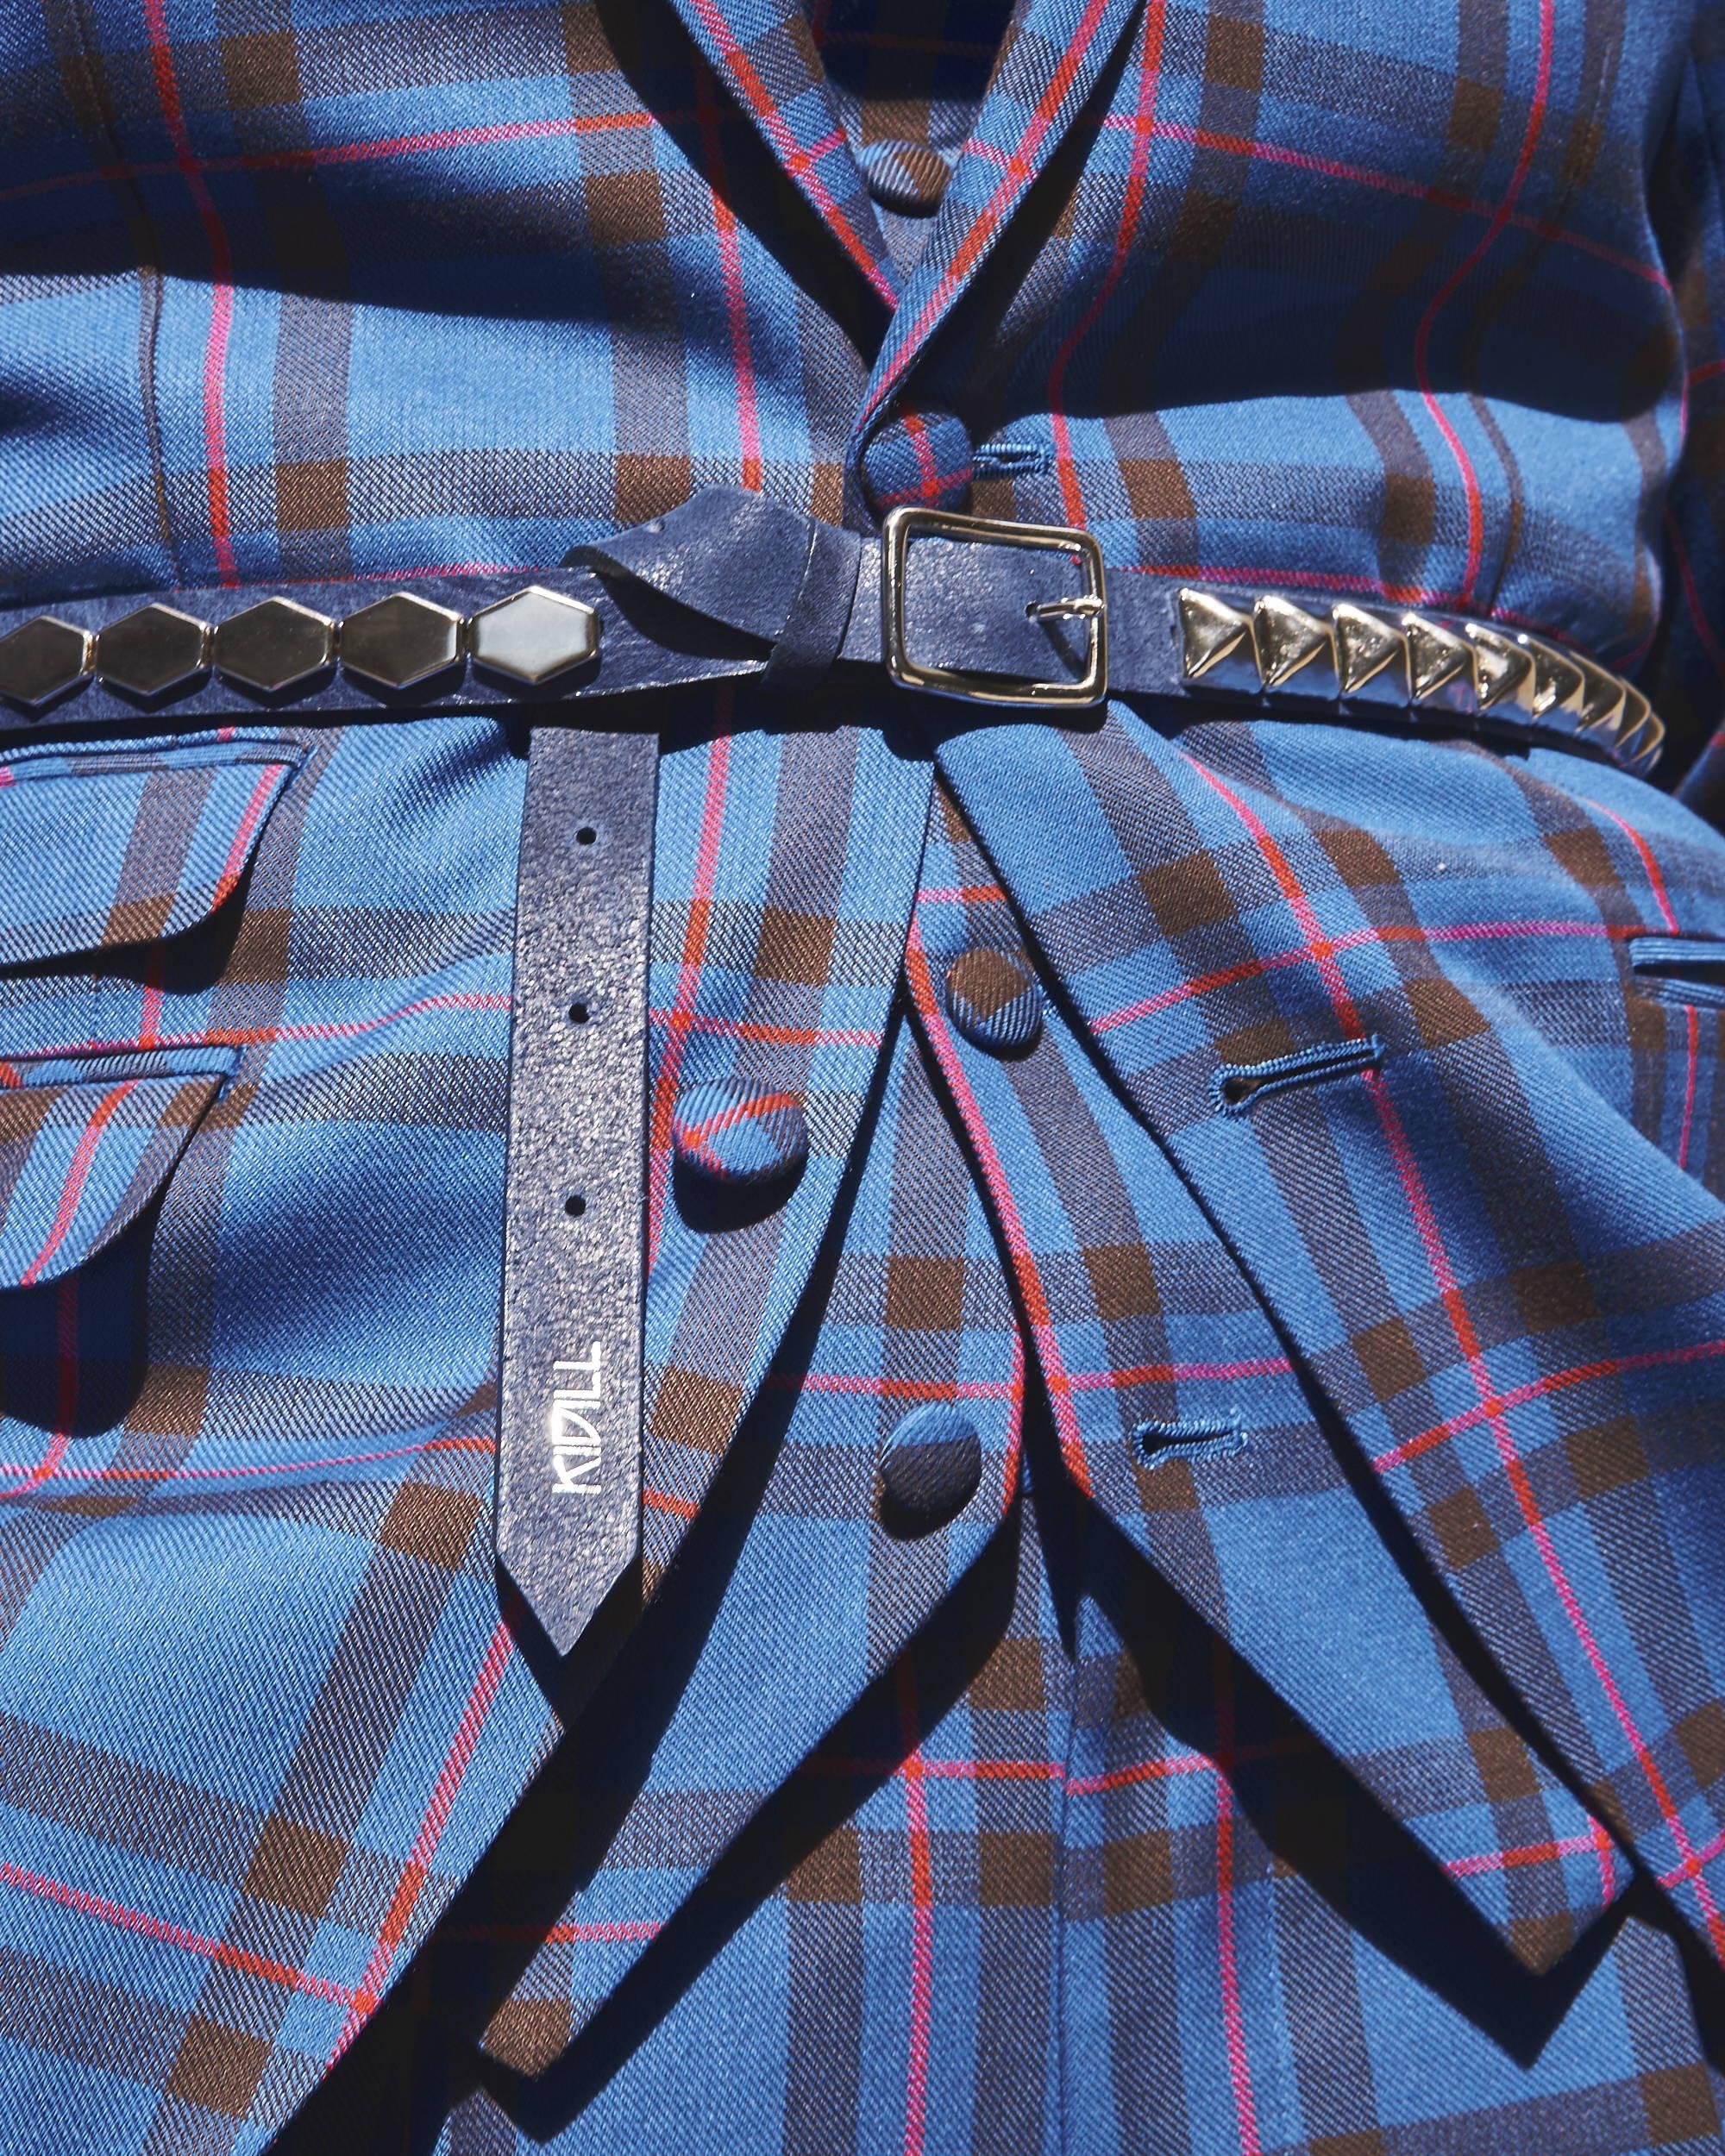 Kidill Buckle Stud Belt SS18 - Hlorenzo